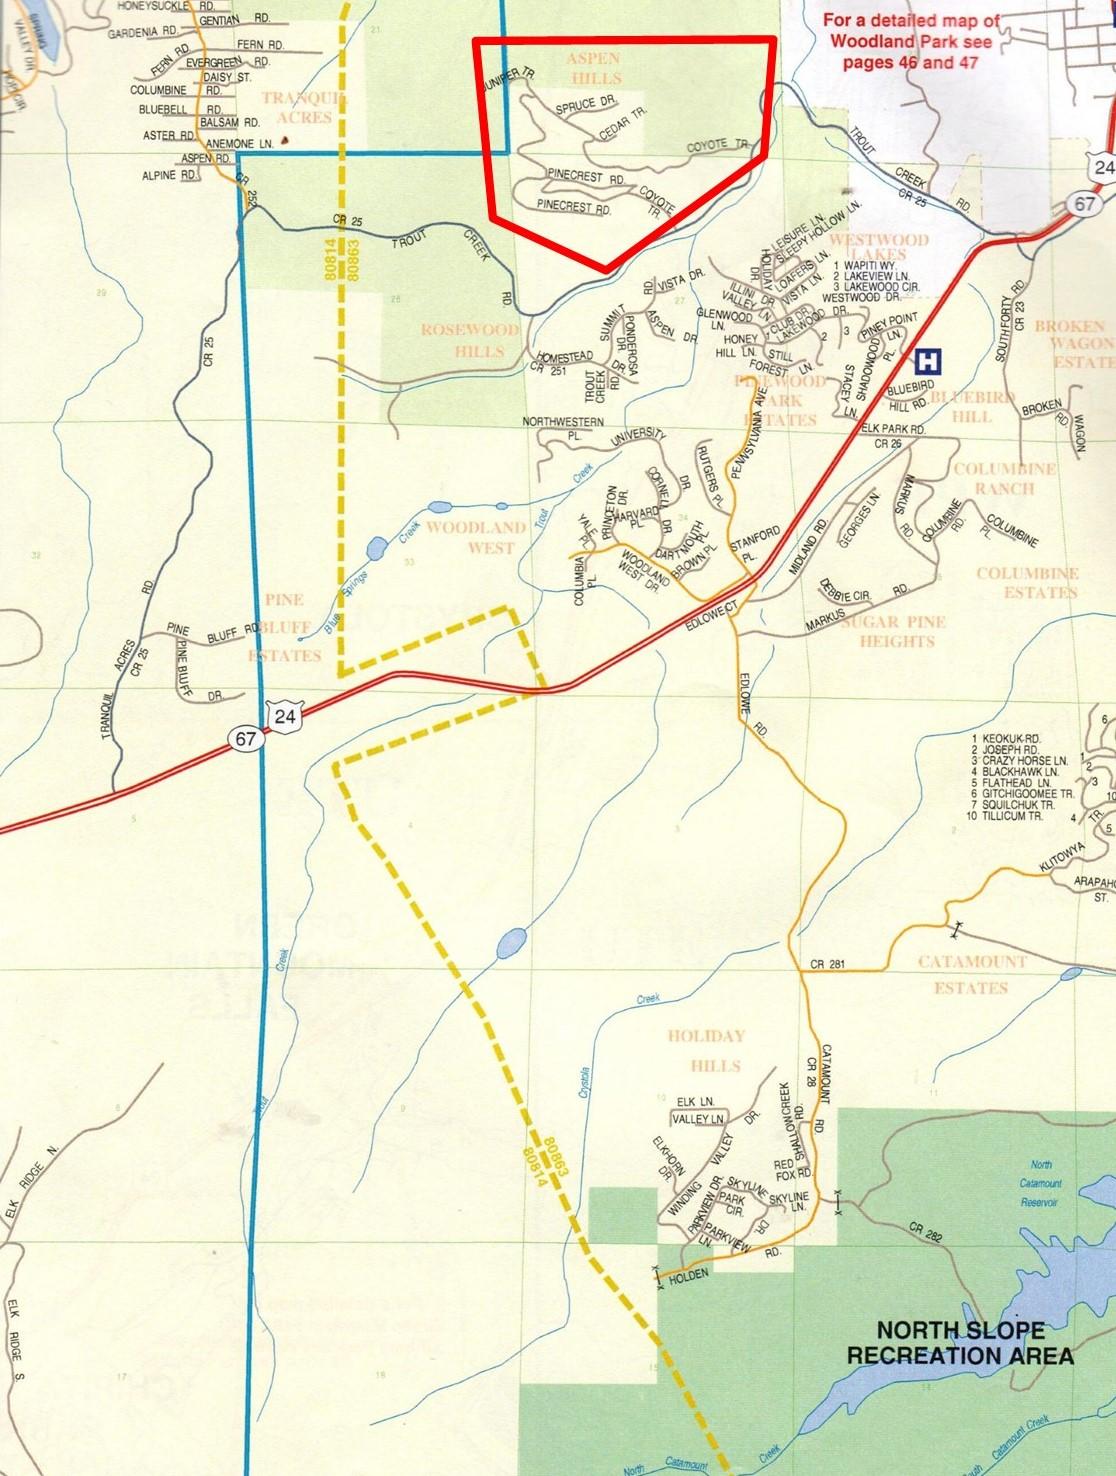 Map of Aspen Hills, Woodland Park, CO